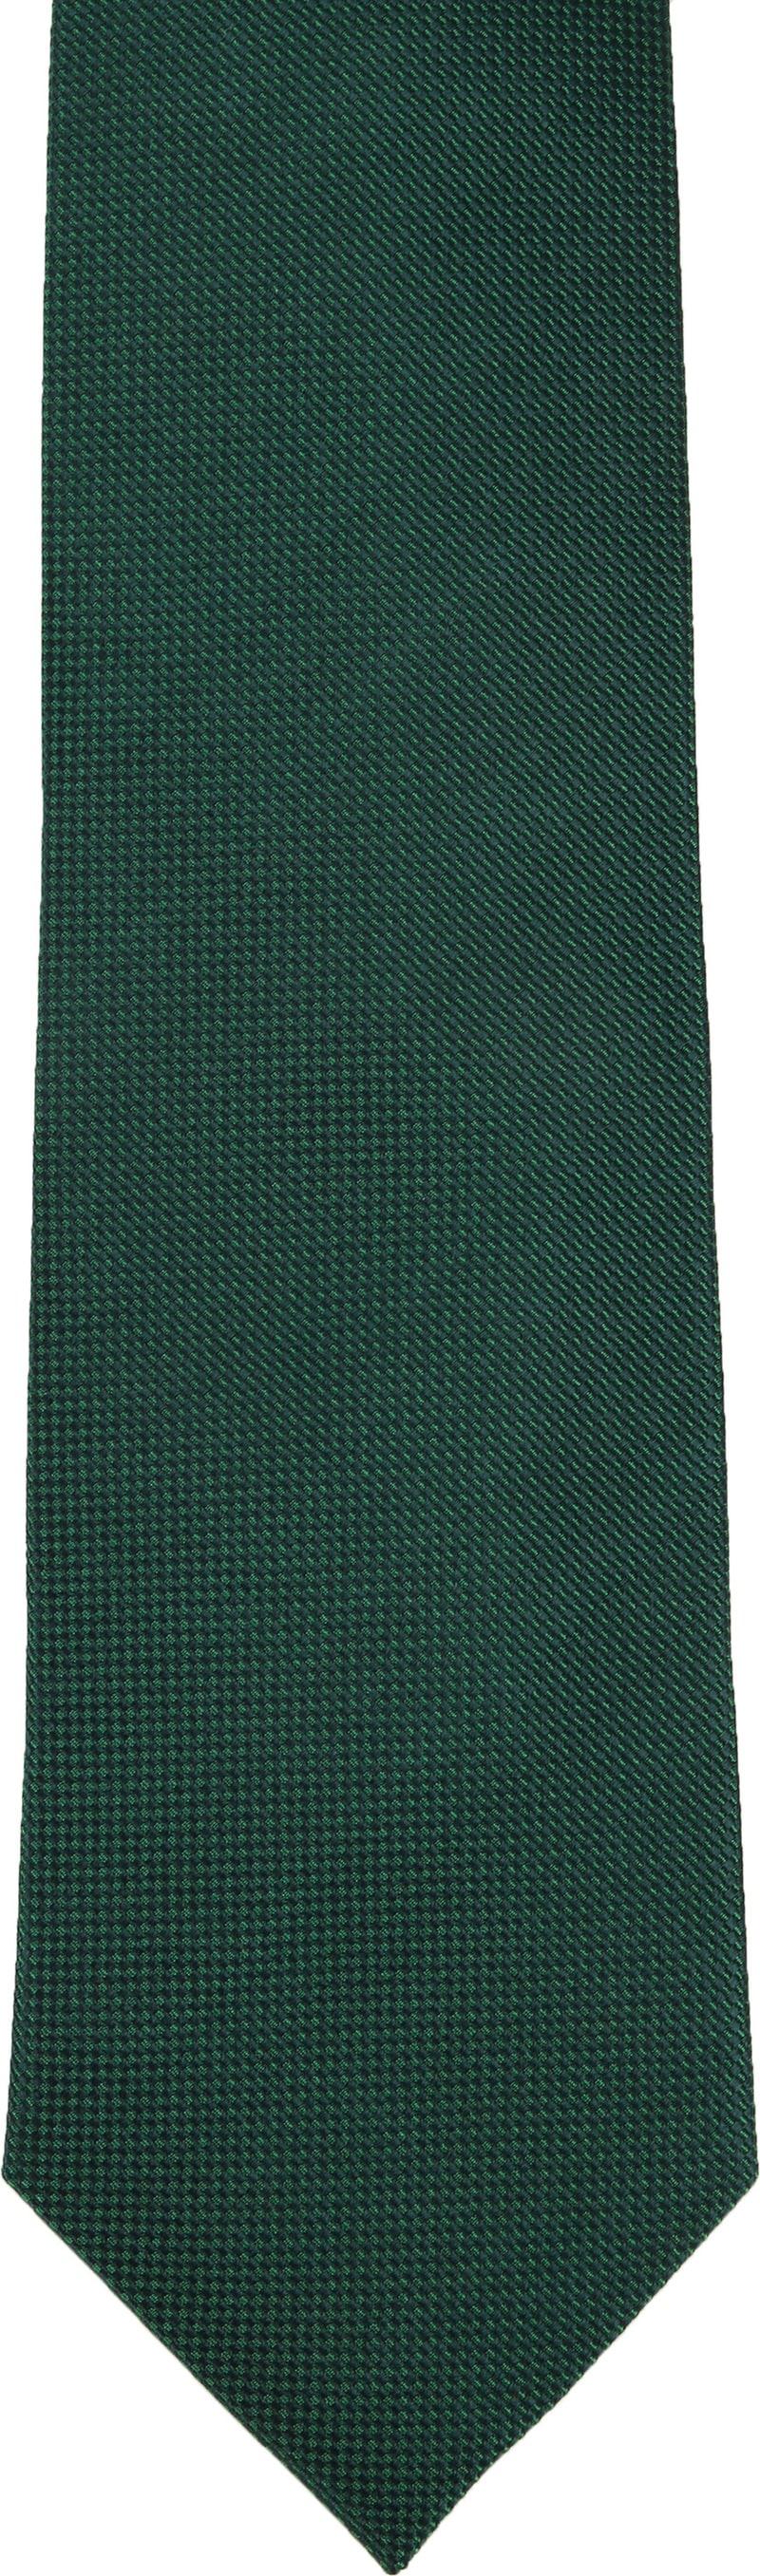 Suitable Tie Silk Green 19 photo 1